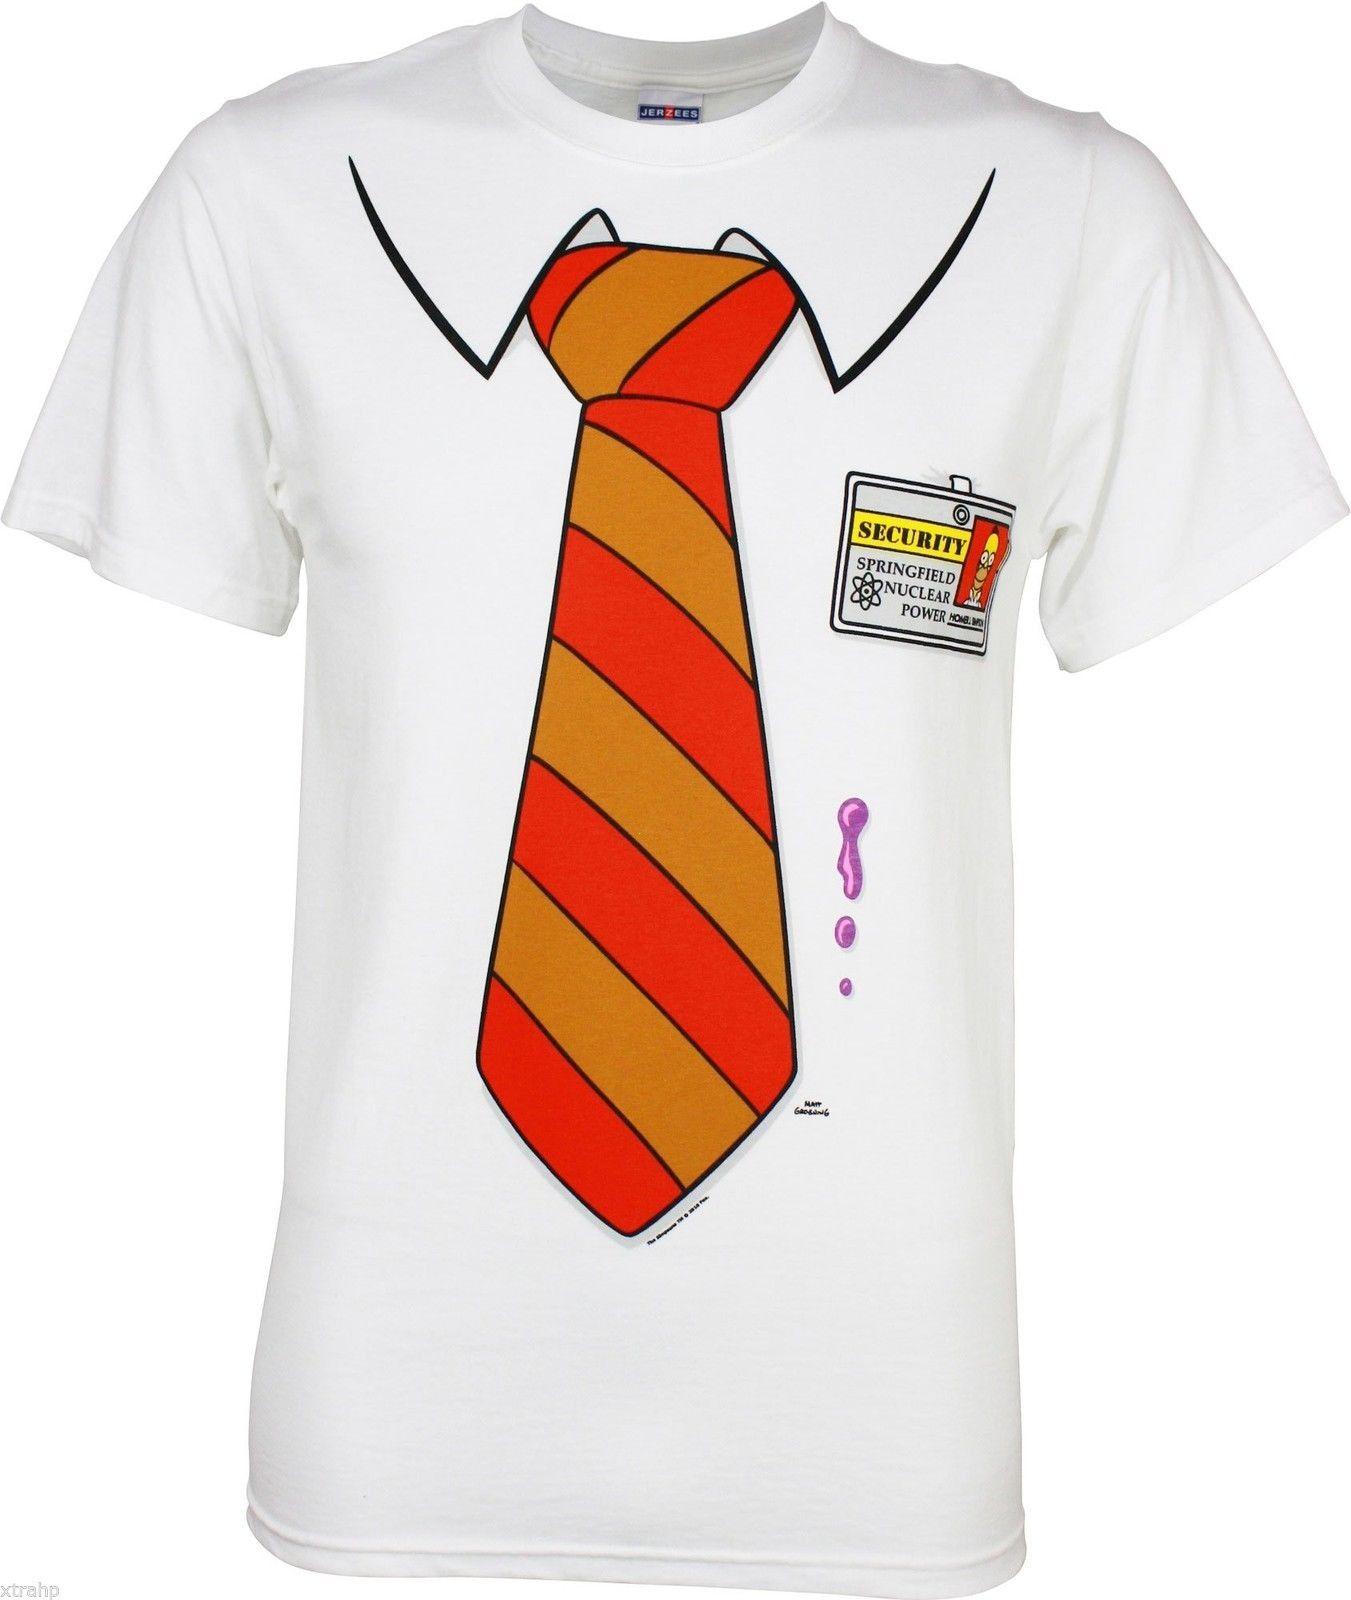 Simpsons Halloween Shirt.Homer Simpson T Shirt Costume Playeras Simpsons T Shirt T Shirt